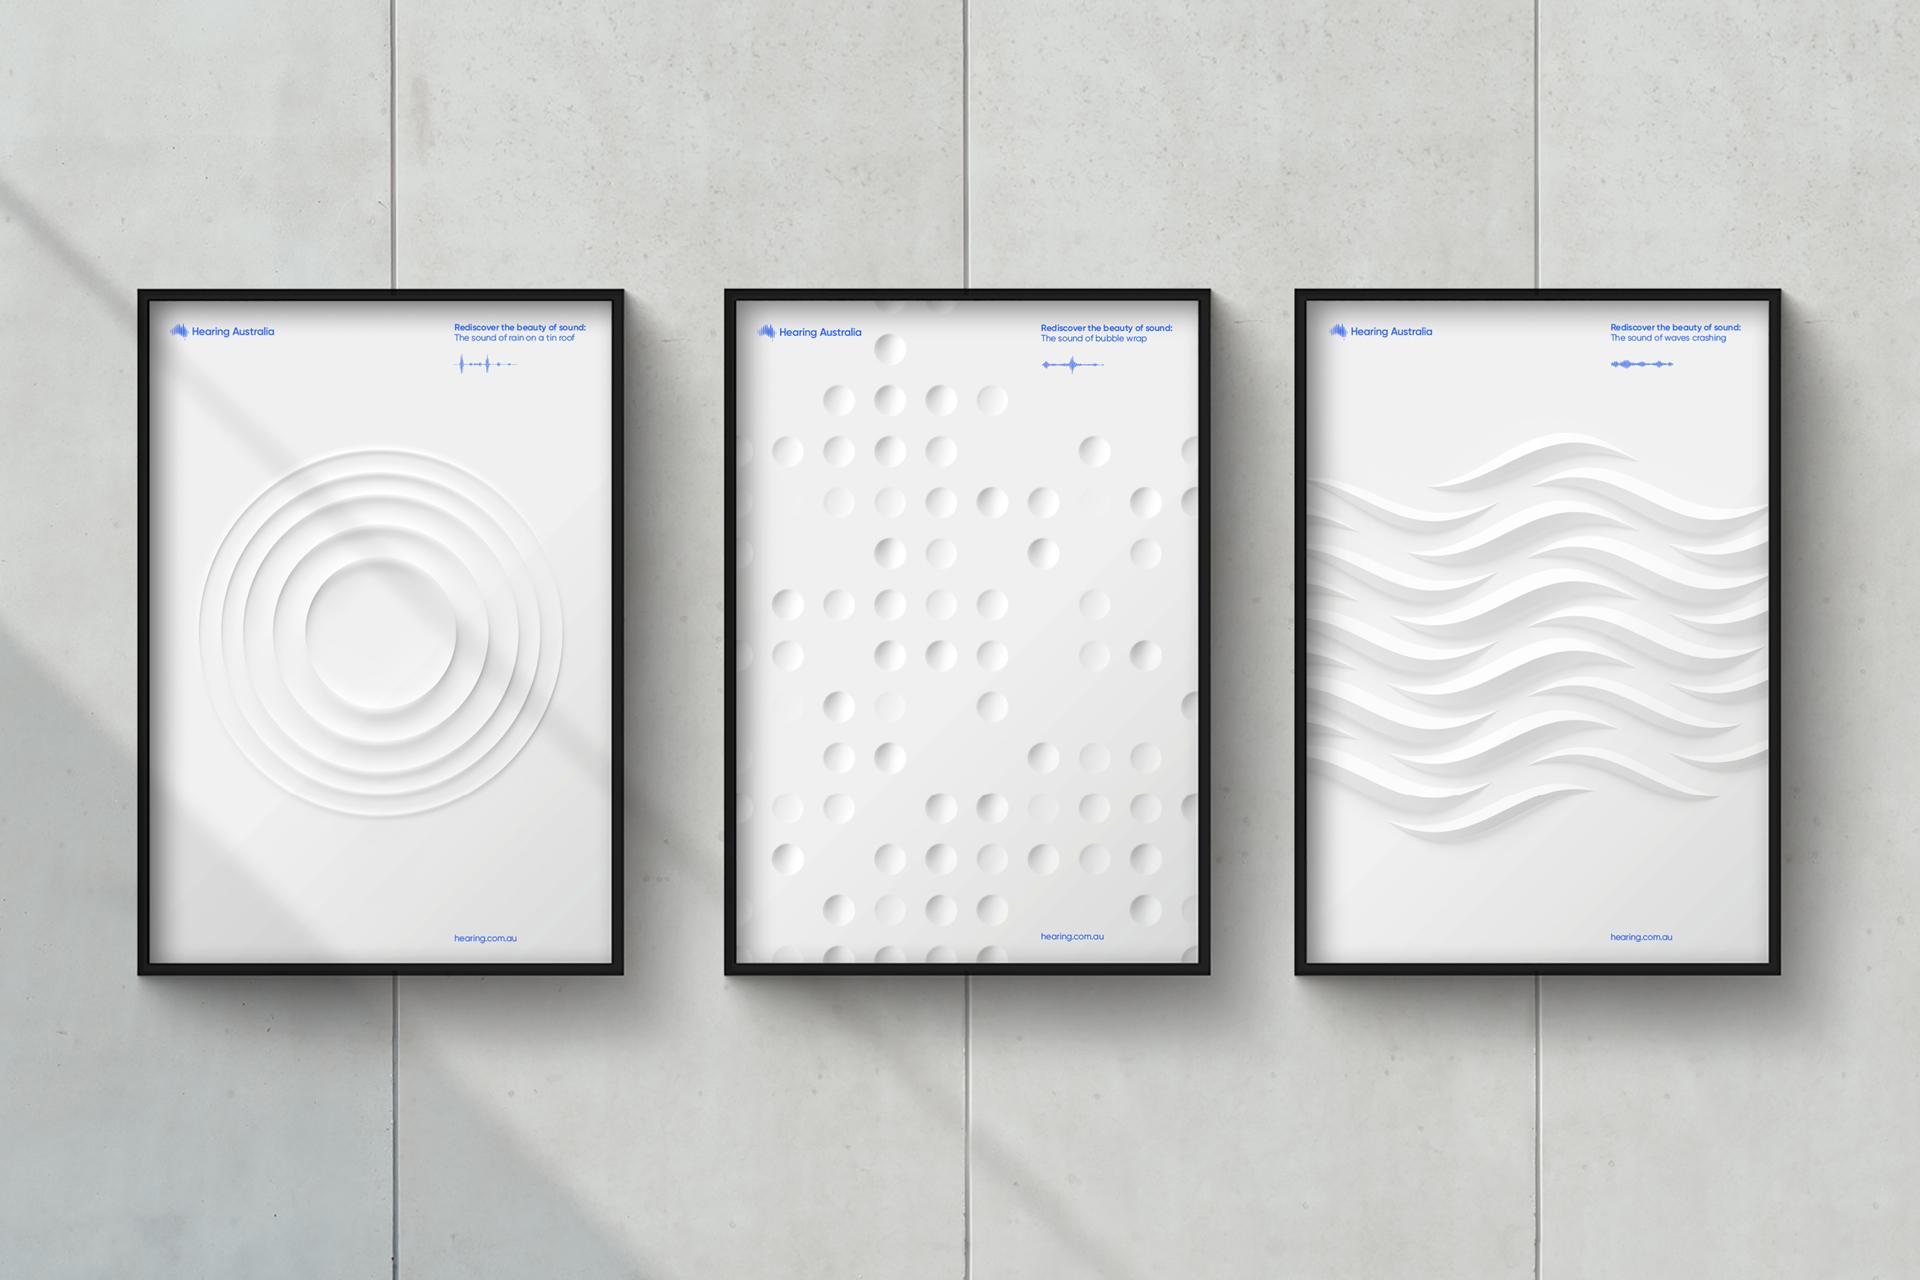 HearingAustralia_3D Posters.jpg